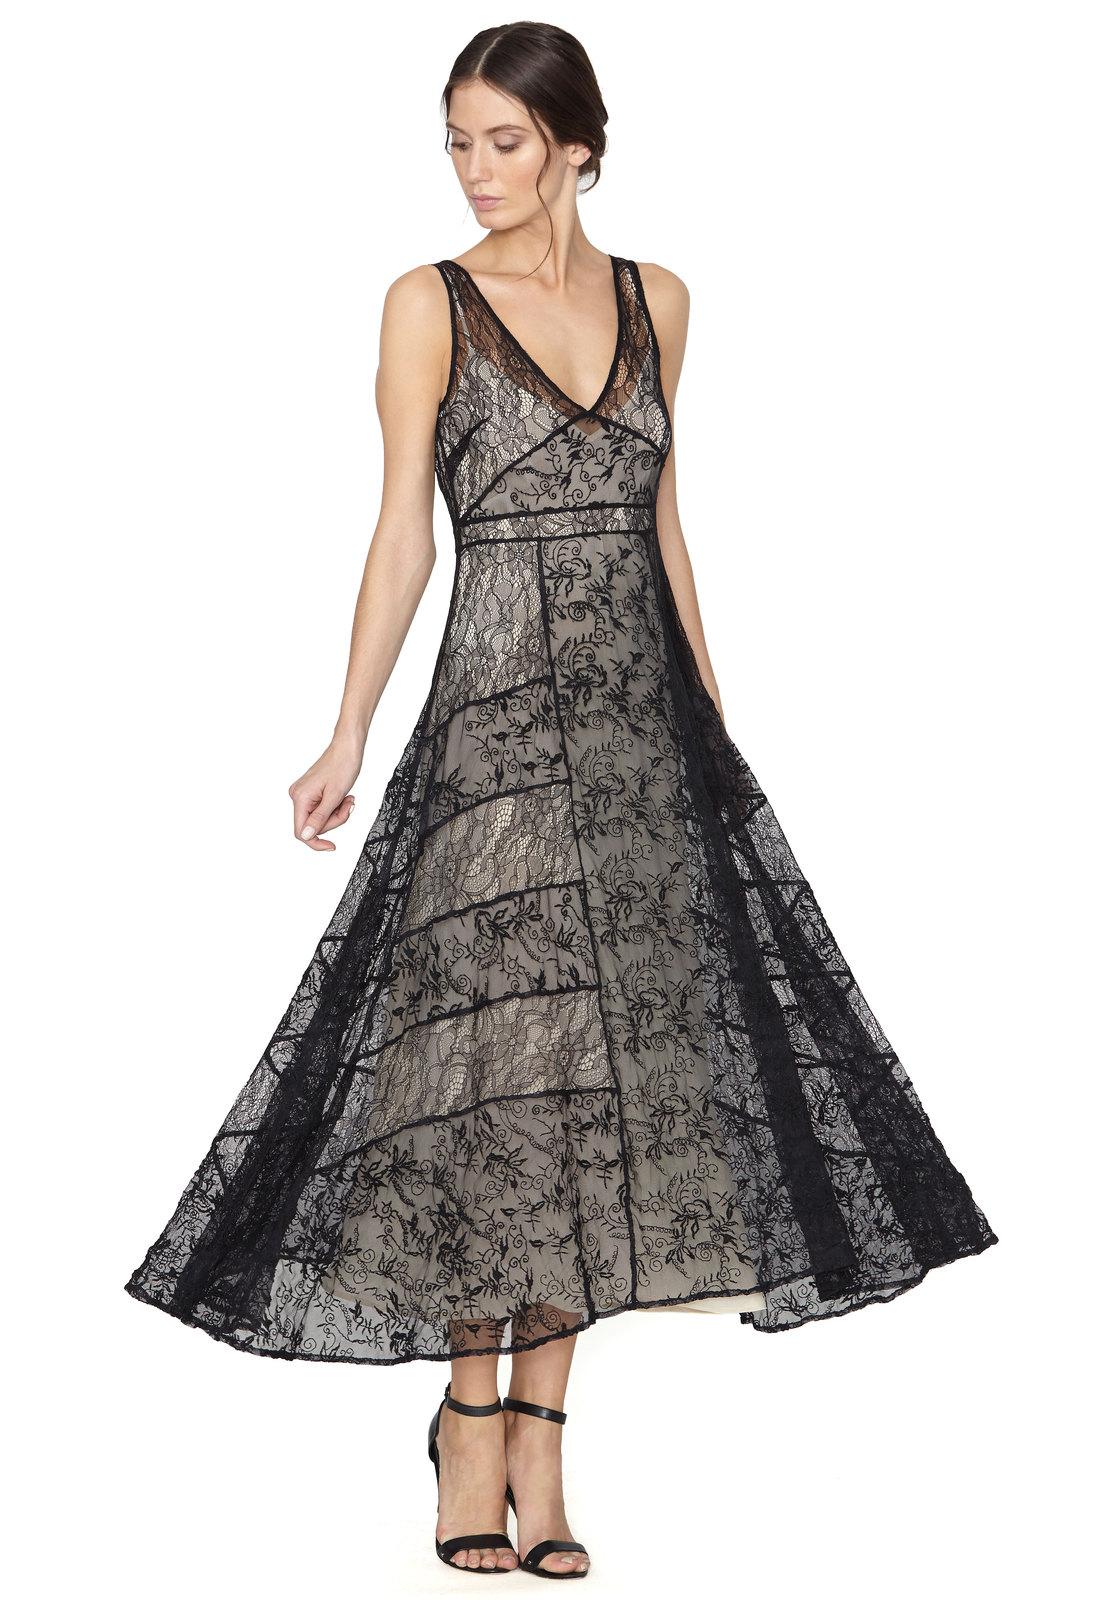 Alice and olivia black maxi dress